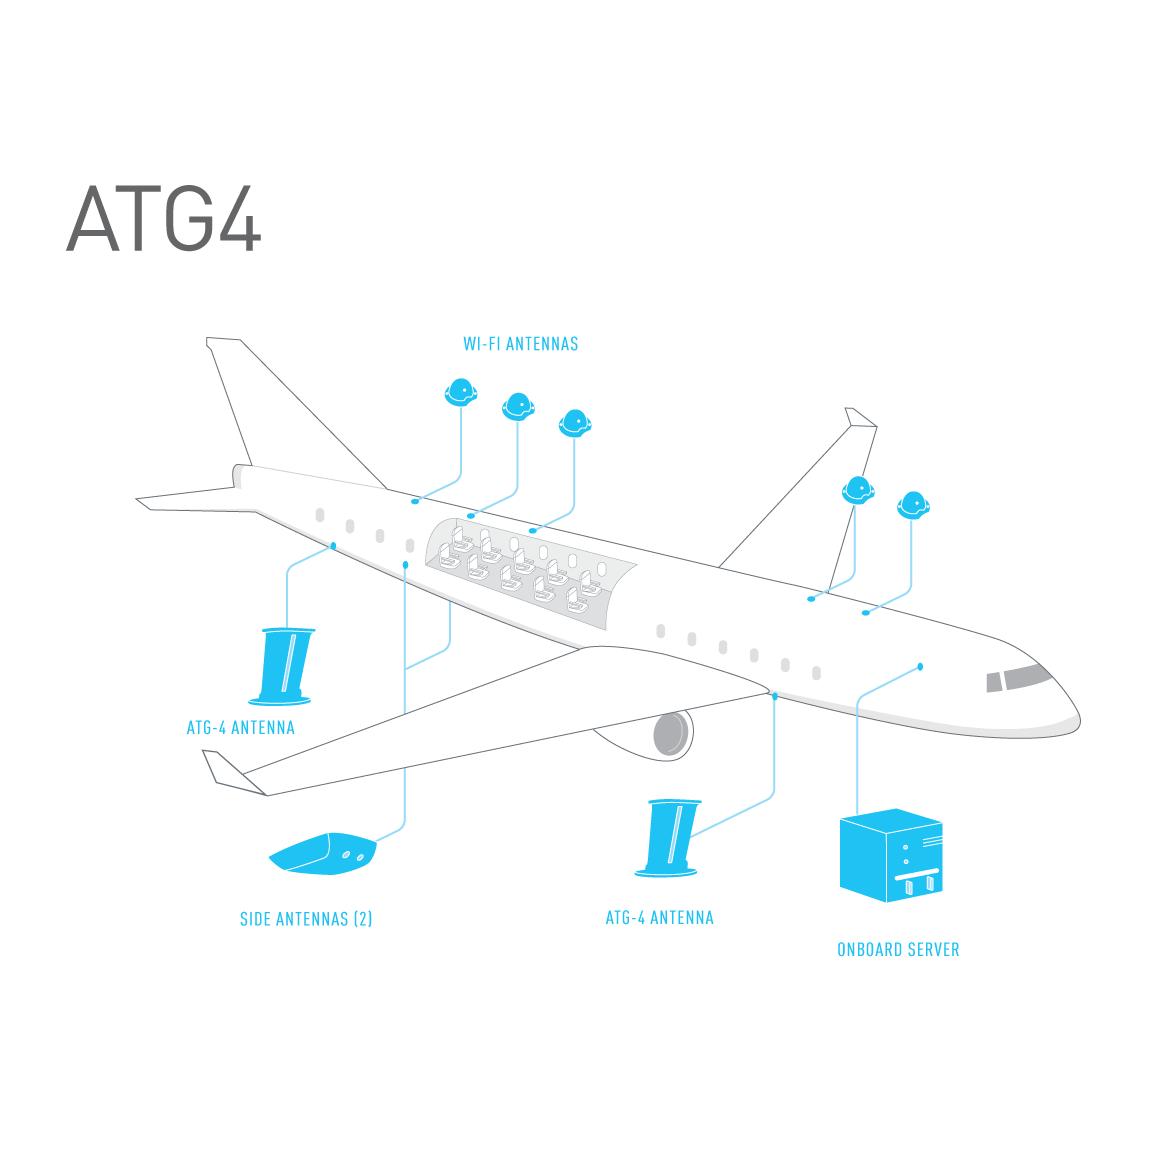 GogoTech_EquipmentDiagrams_ATG4